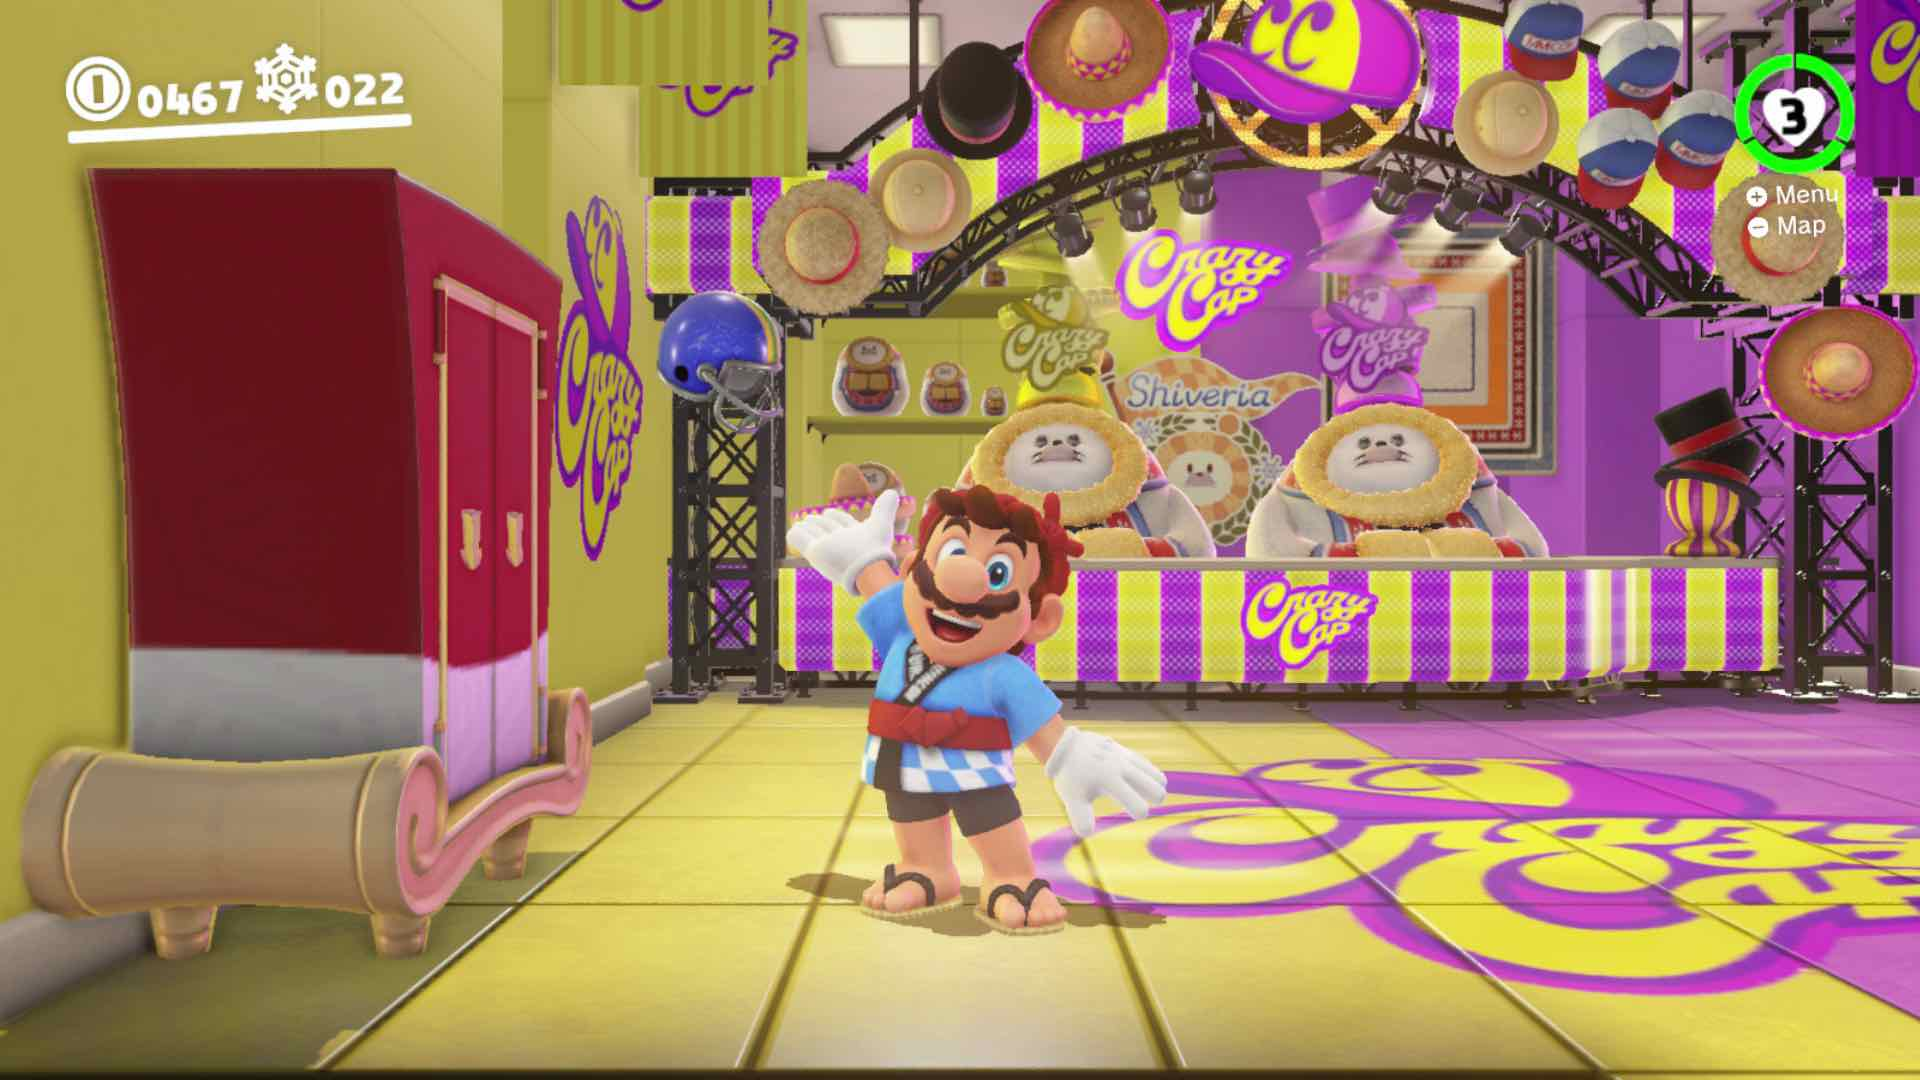 happi-outfit-super-mario-odyssey-screenshot